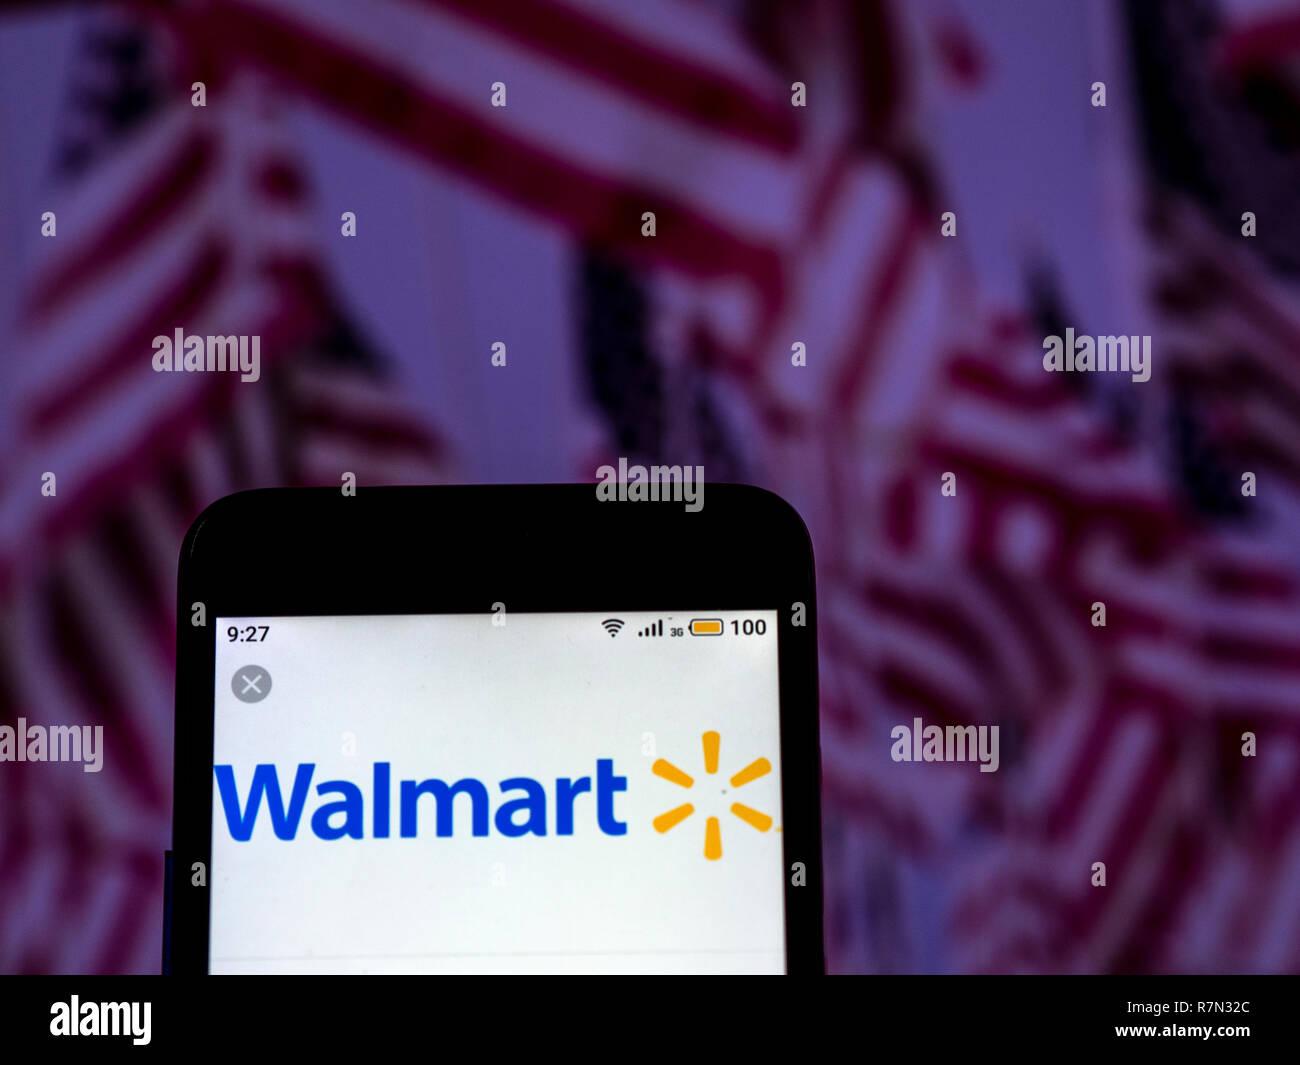 Walmart Stock Phone Number >> Walmart Logo Seen Displayed On Smart Phone Stock Photo